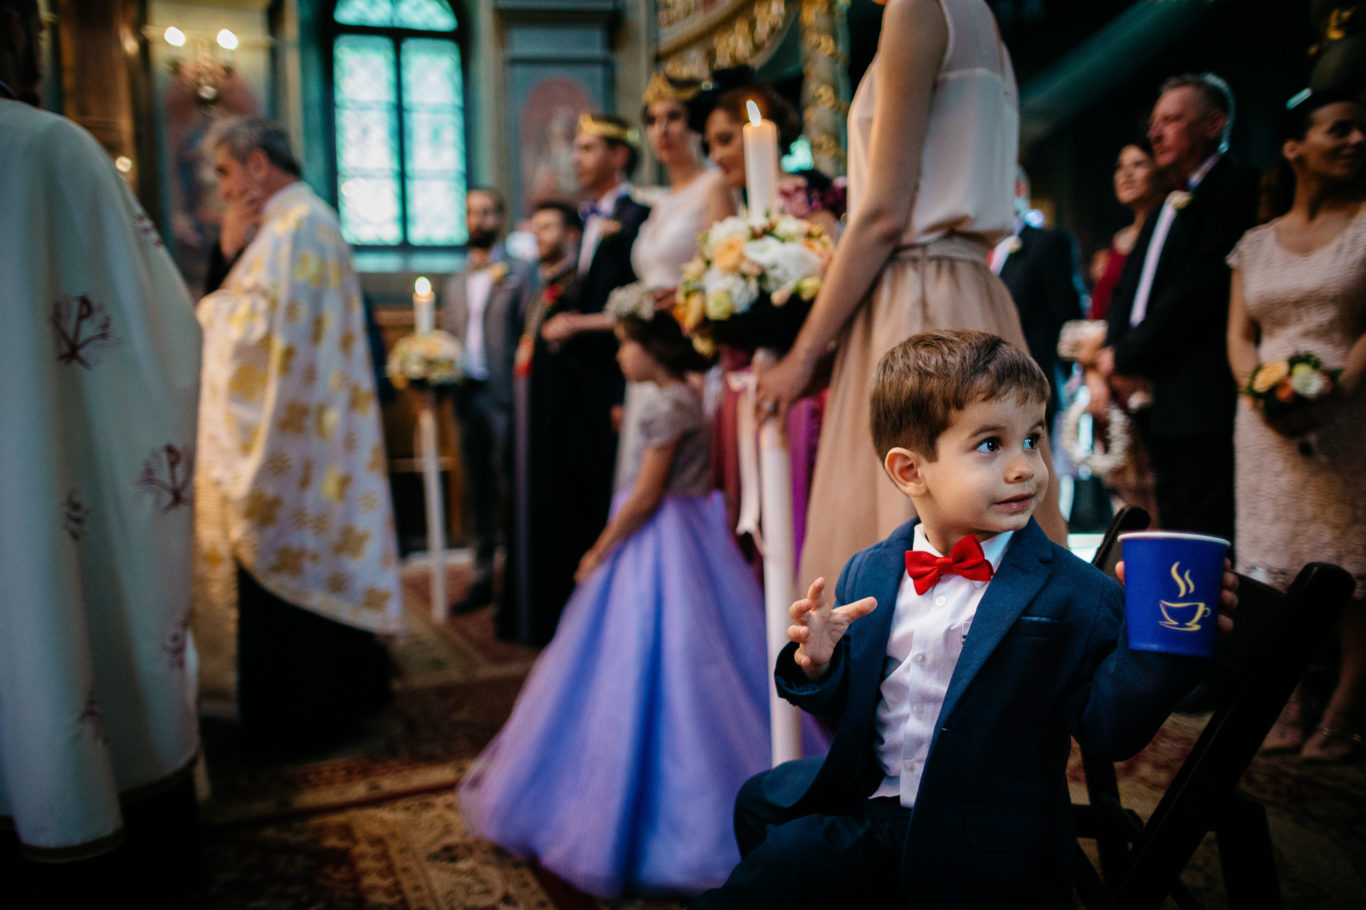 0367-Fotografie-nunta-Bucuresti-Oana-Catalin-fotograf-Ciprian-Dumitrescu-DCF_2098